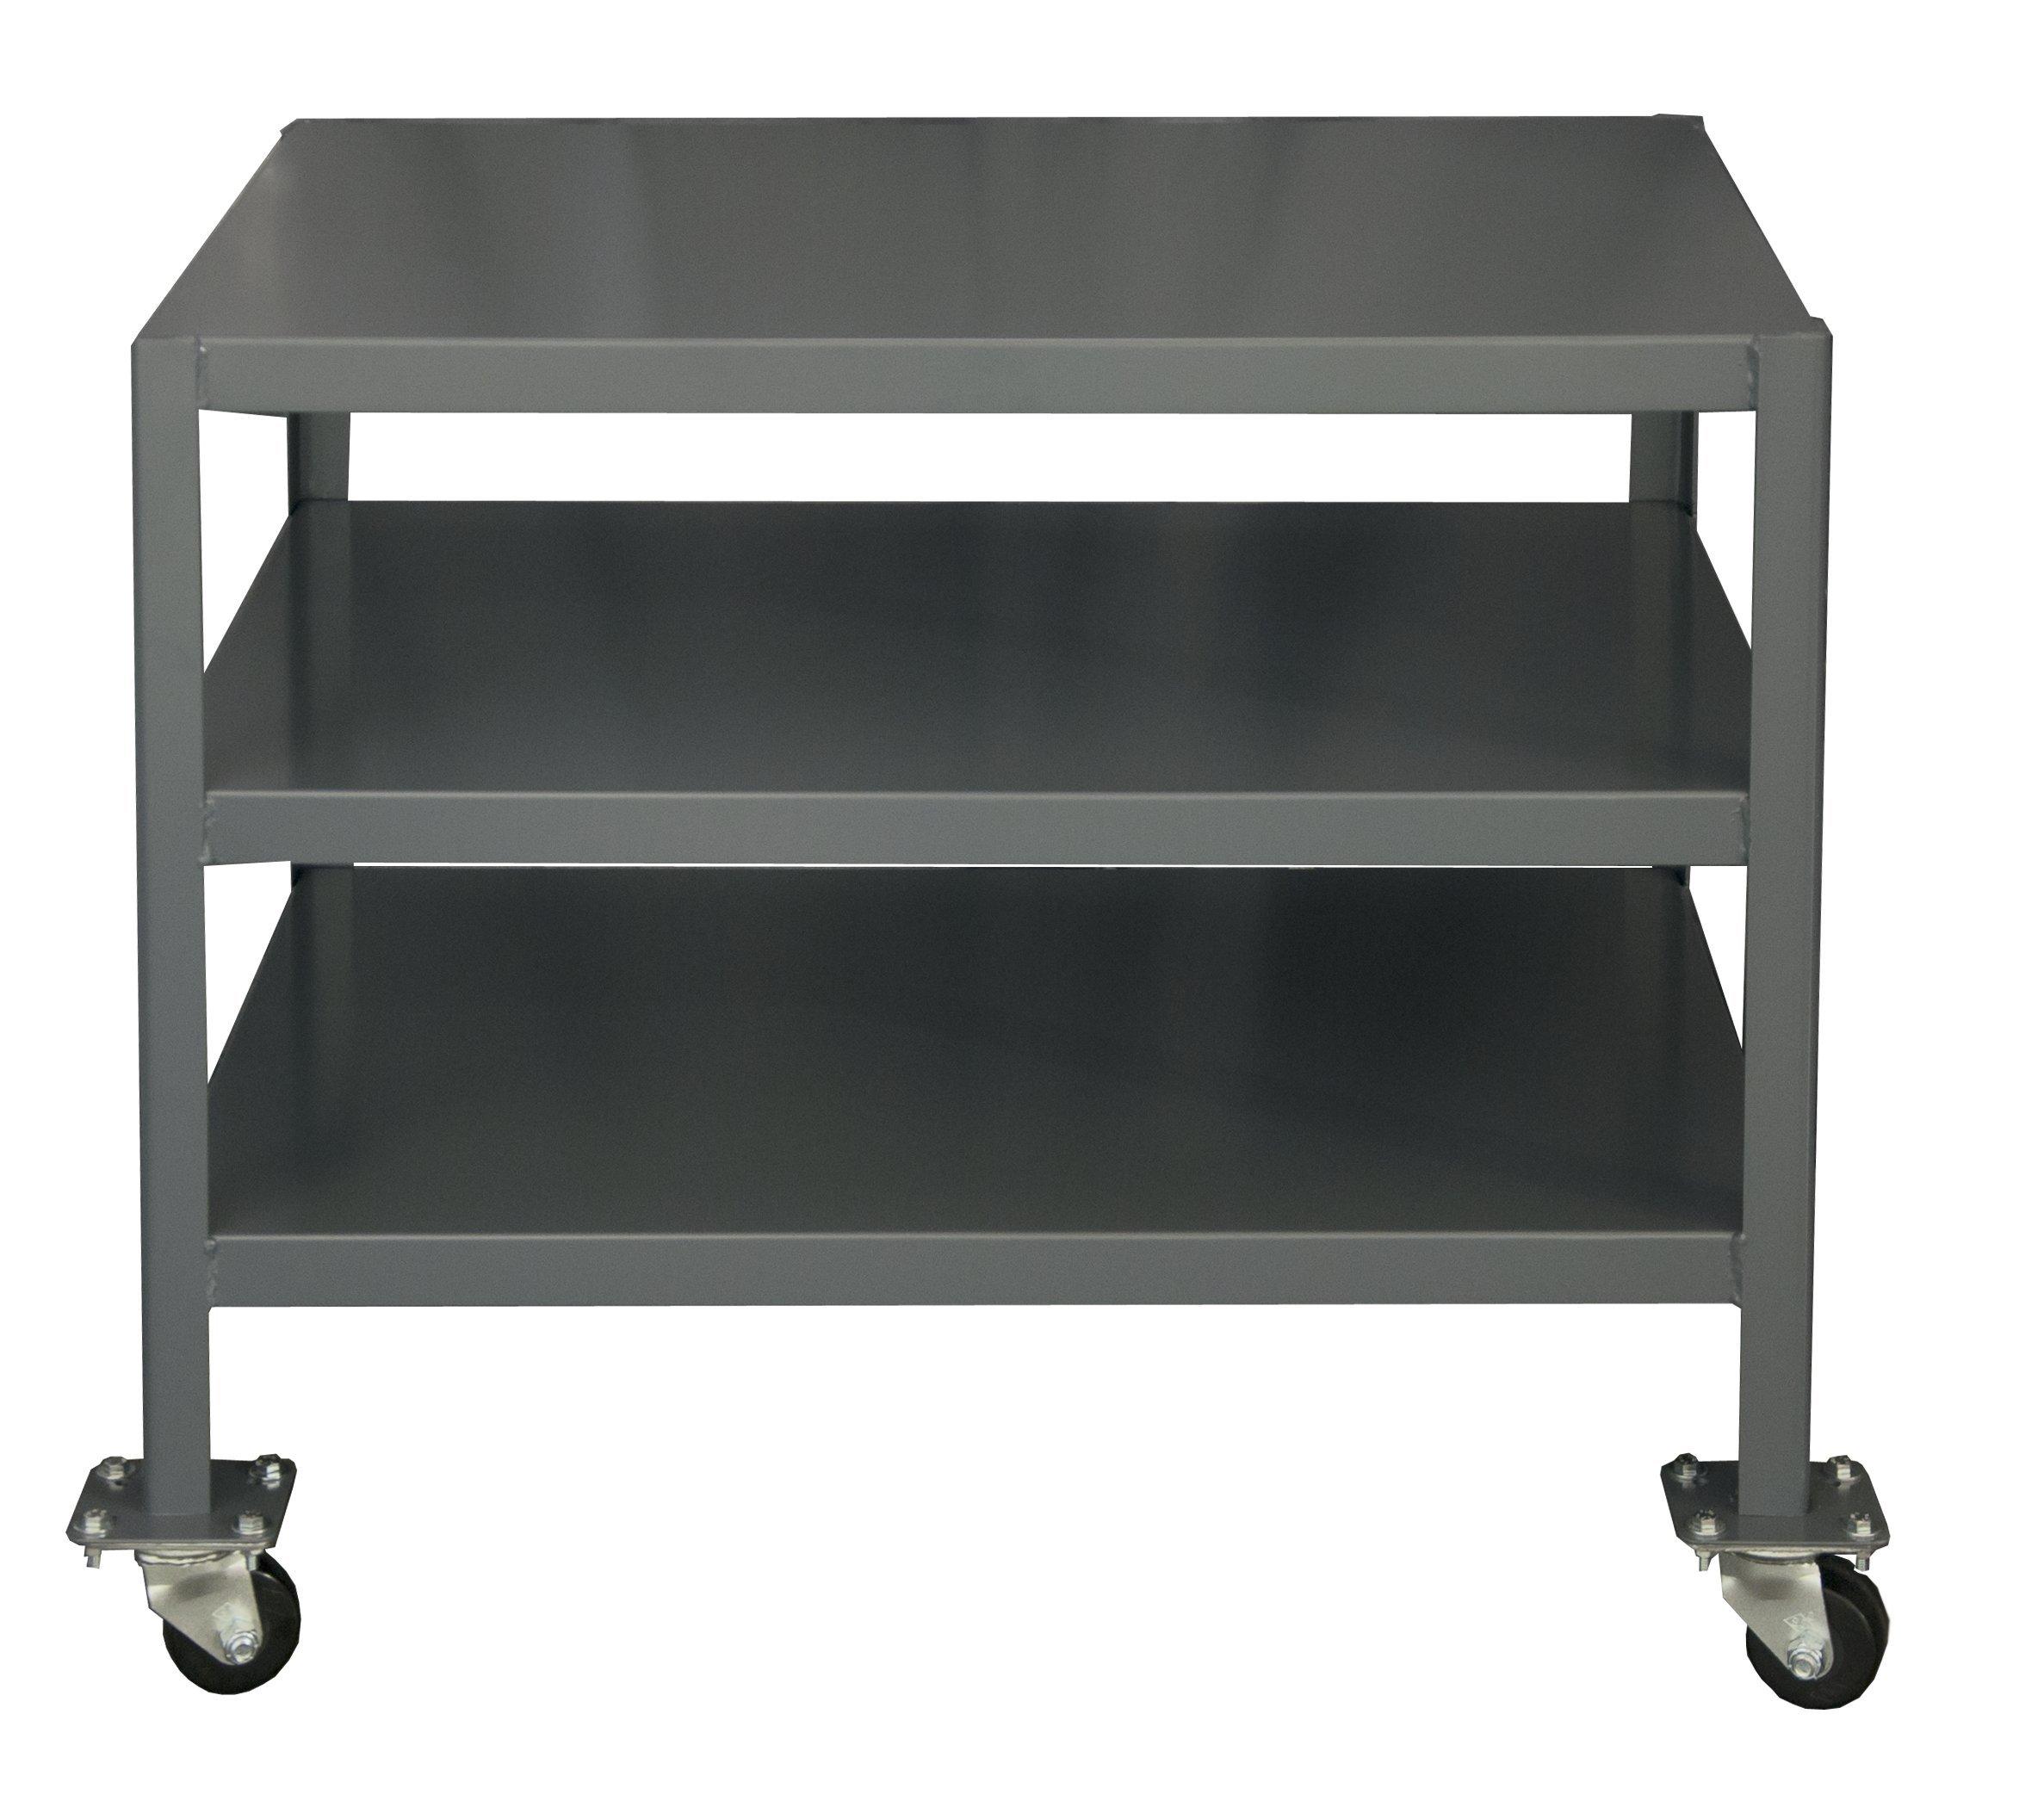 Durham Steel Mobile Medium Duty Machine Table, MTM243630-2K395, 3 Shelves, 2000 lbs Capacity, 36'' Length x 24'' Width x 30'' Height